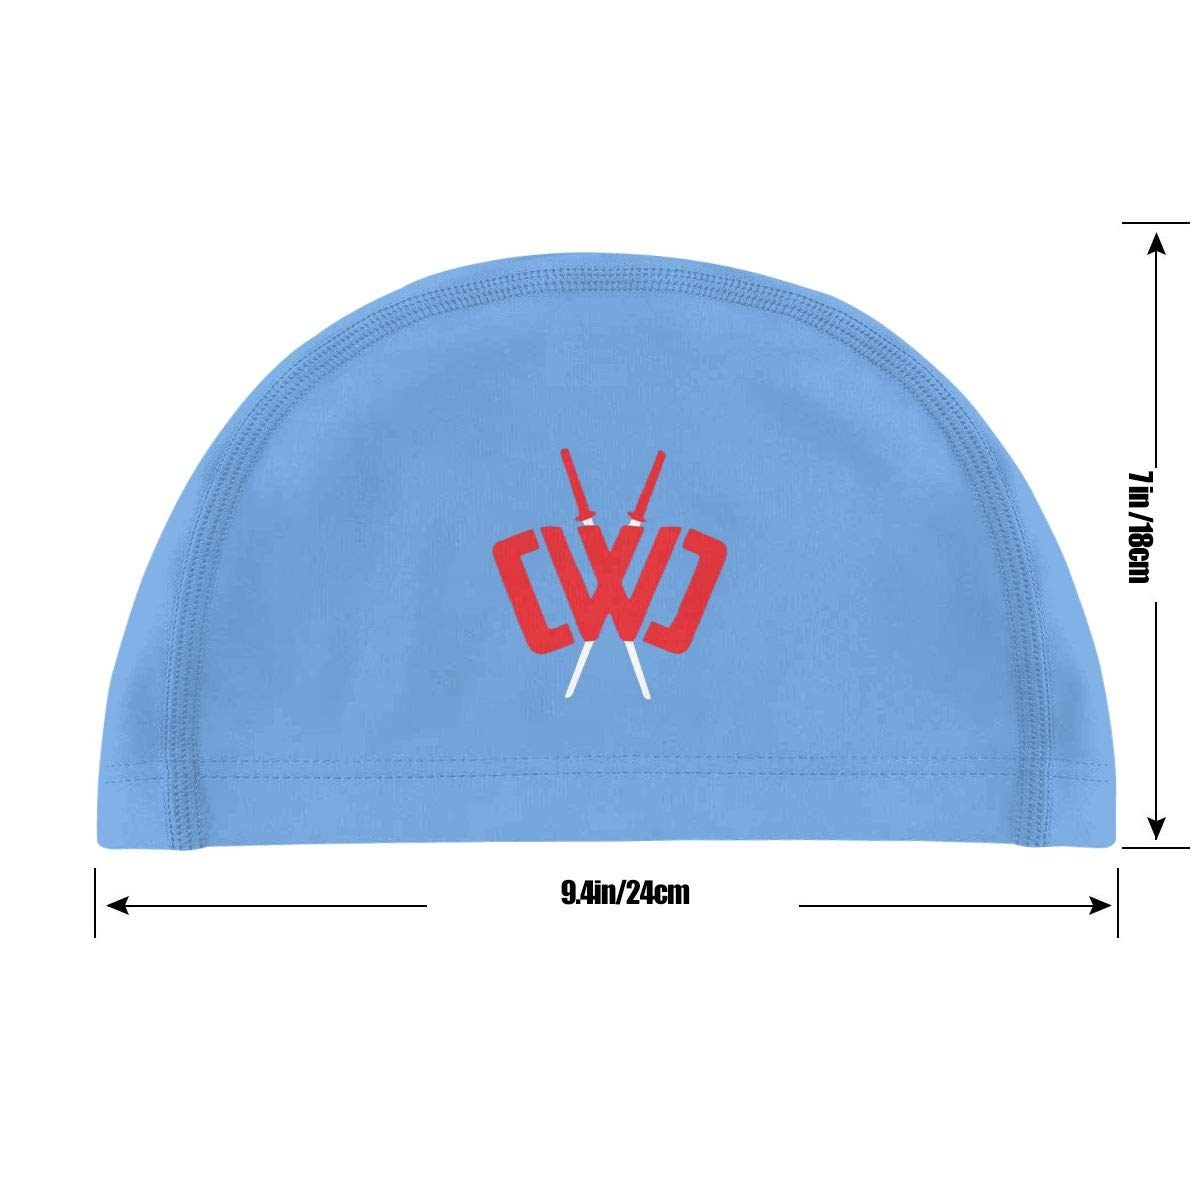 CWC Chad Wild Clay Ninja Swimming Cap Bathing Caps for Men Women